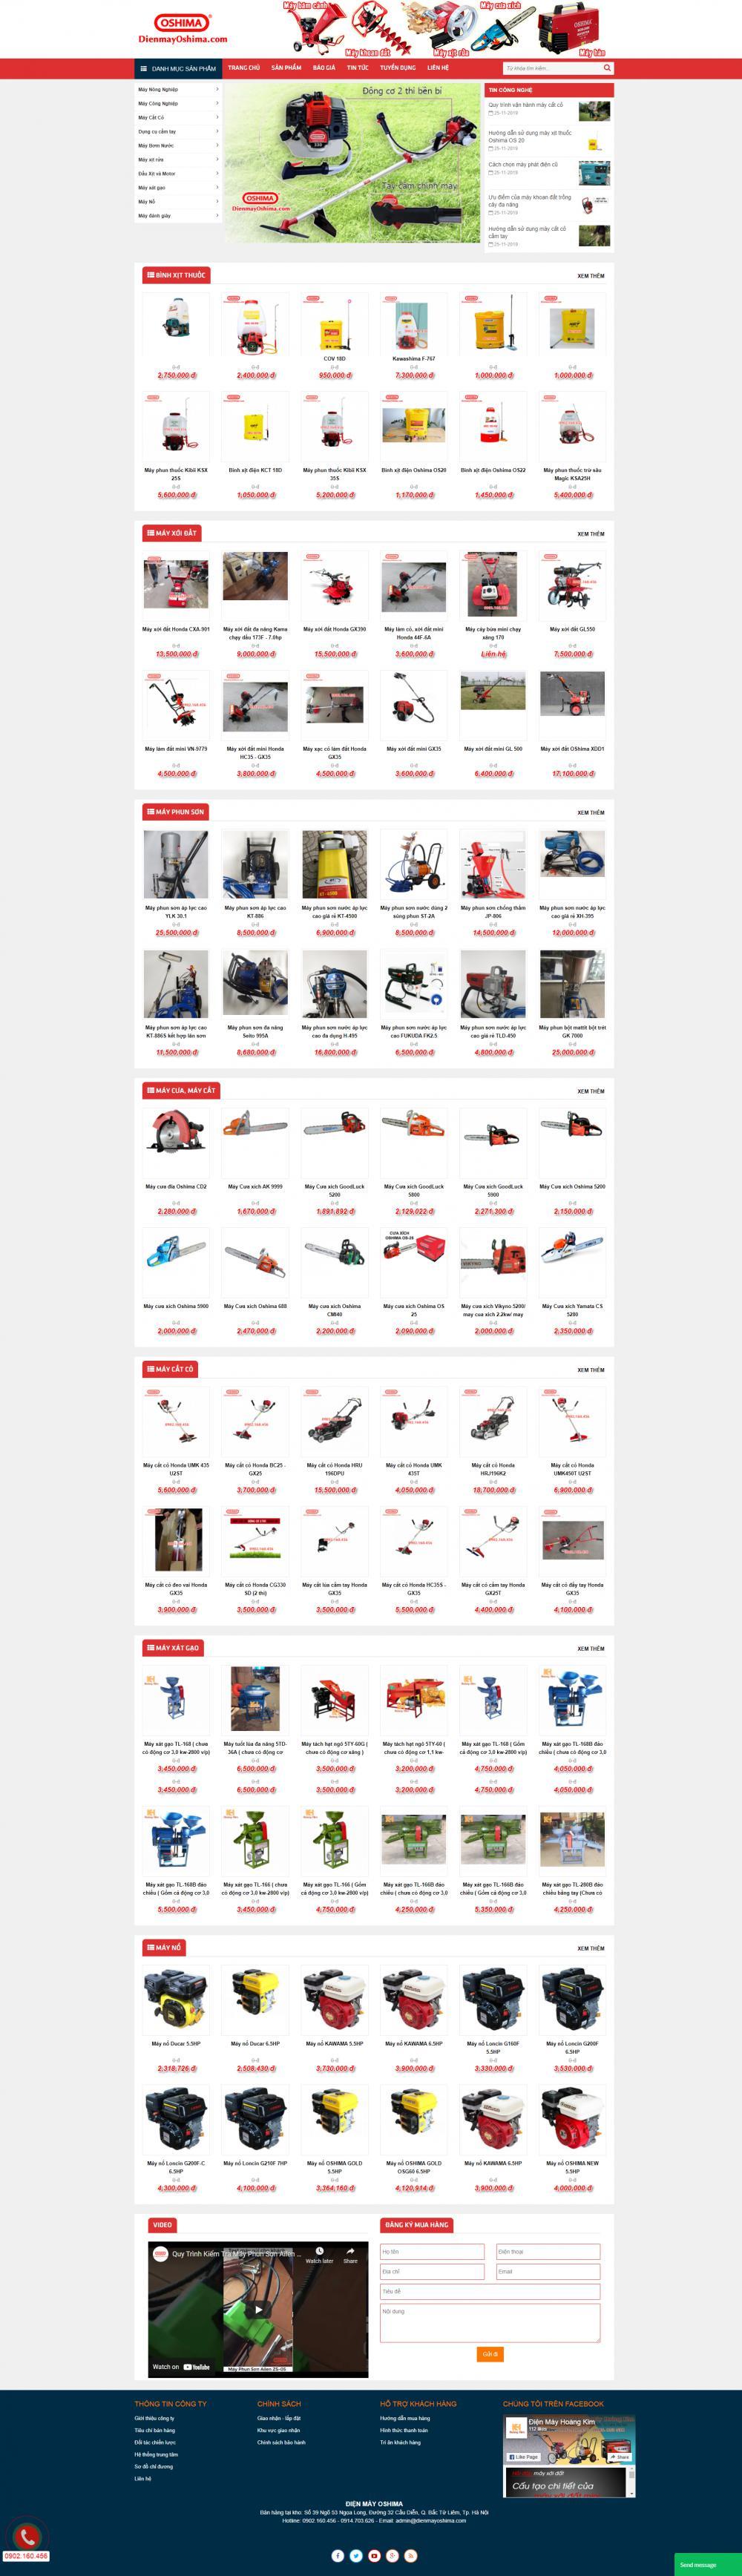 dienmayoshima.com